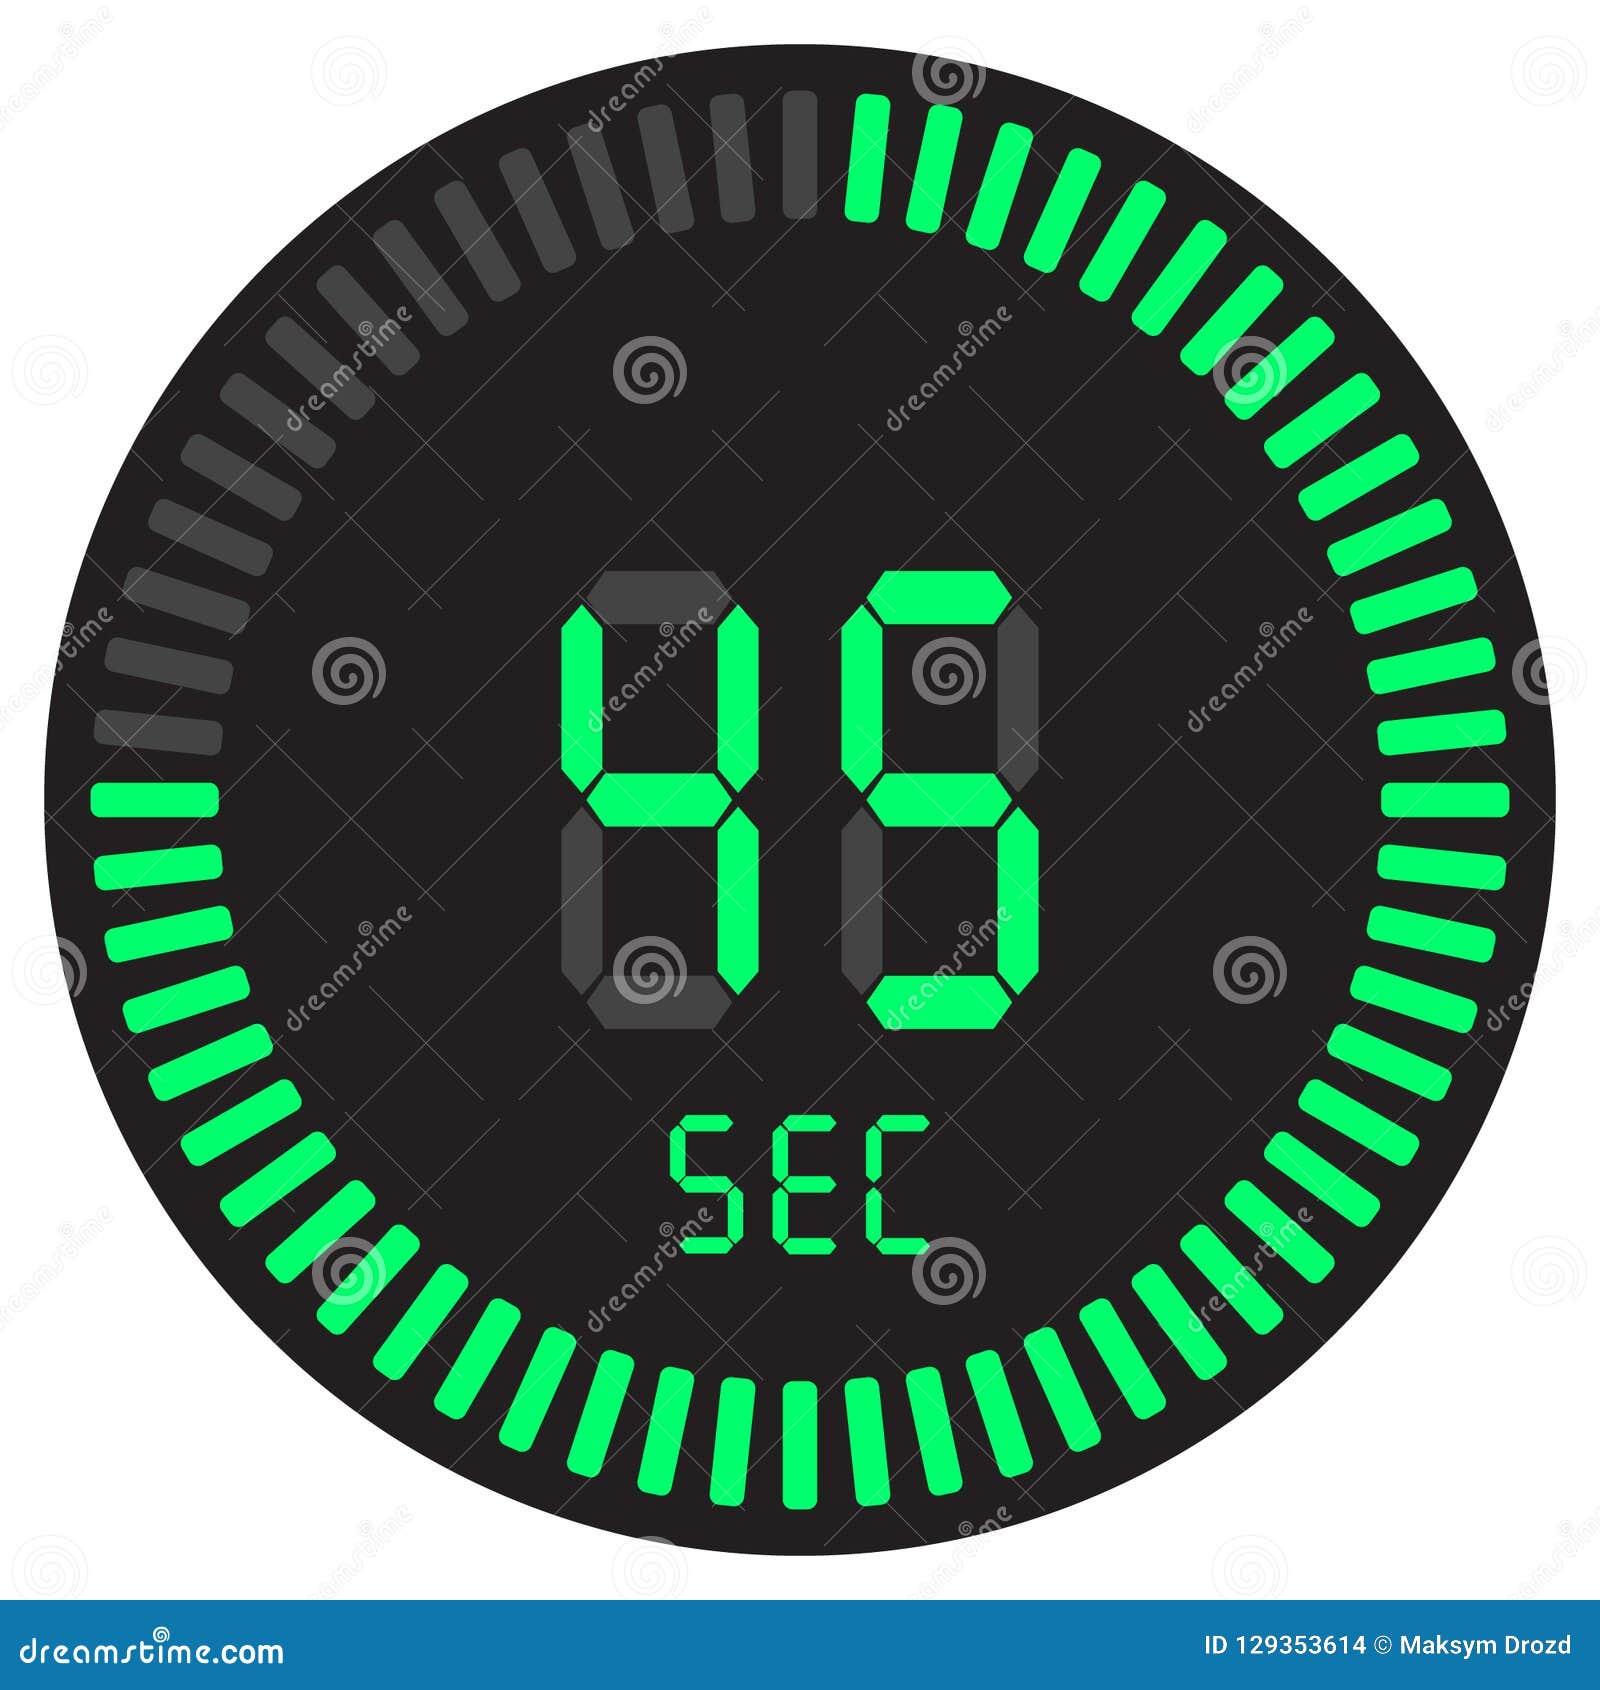 Цифровой таймер 45 секунд электронный секундомер при шкала градиента начиная значок вектора, часы и вахту, таймер, комплекс предп